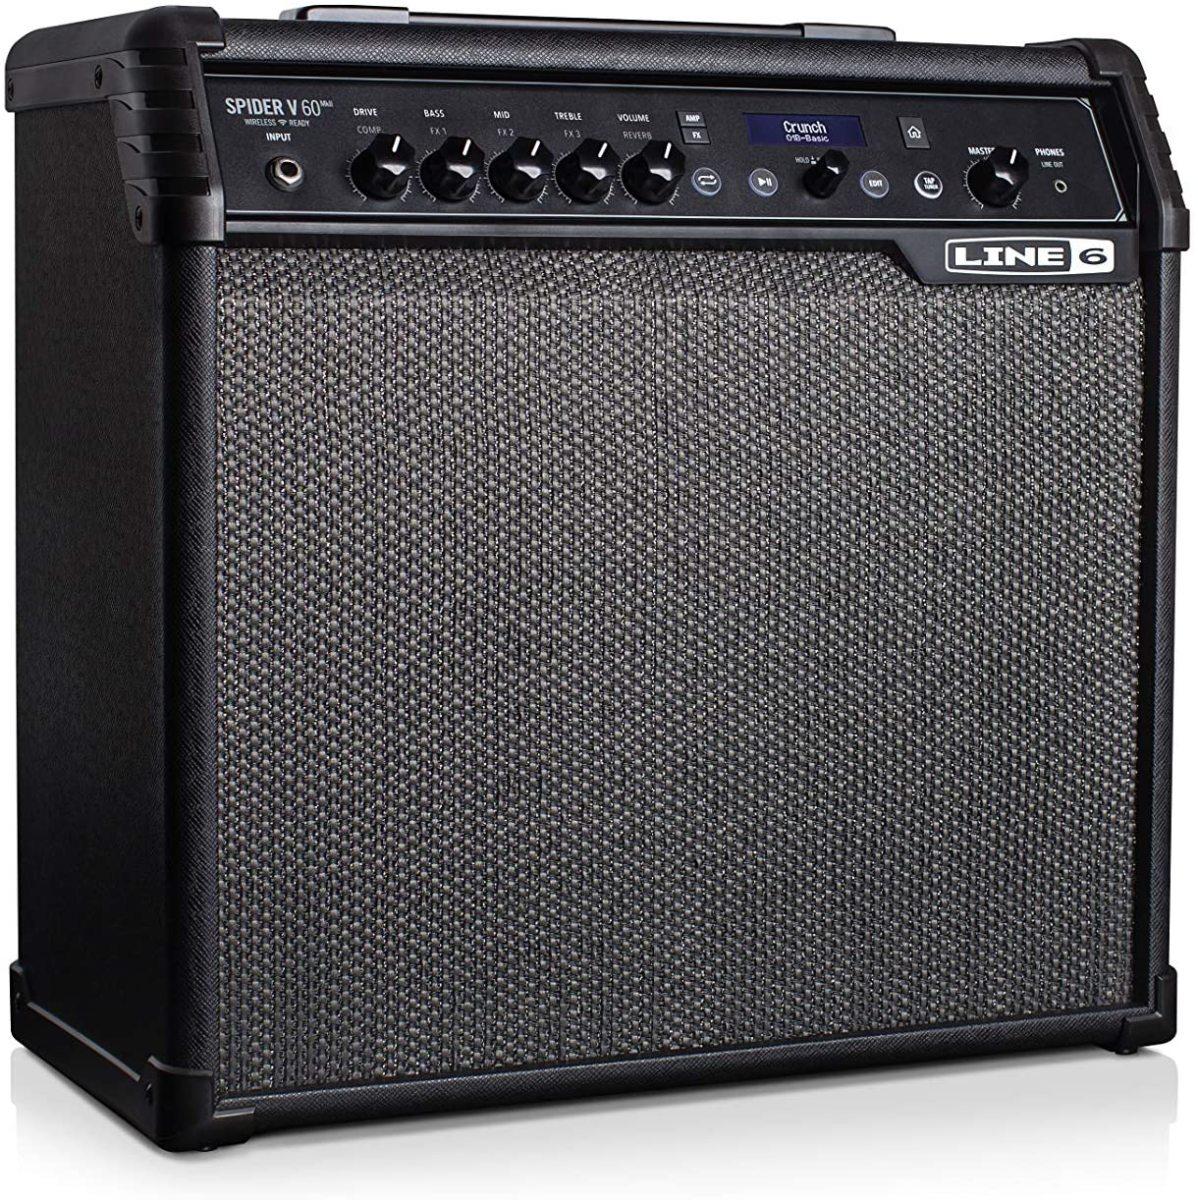 Line 6 Spider V Mk II Series Guitar Amp Review